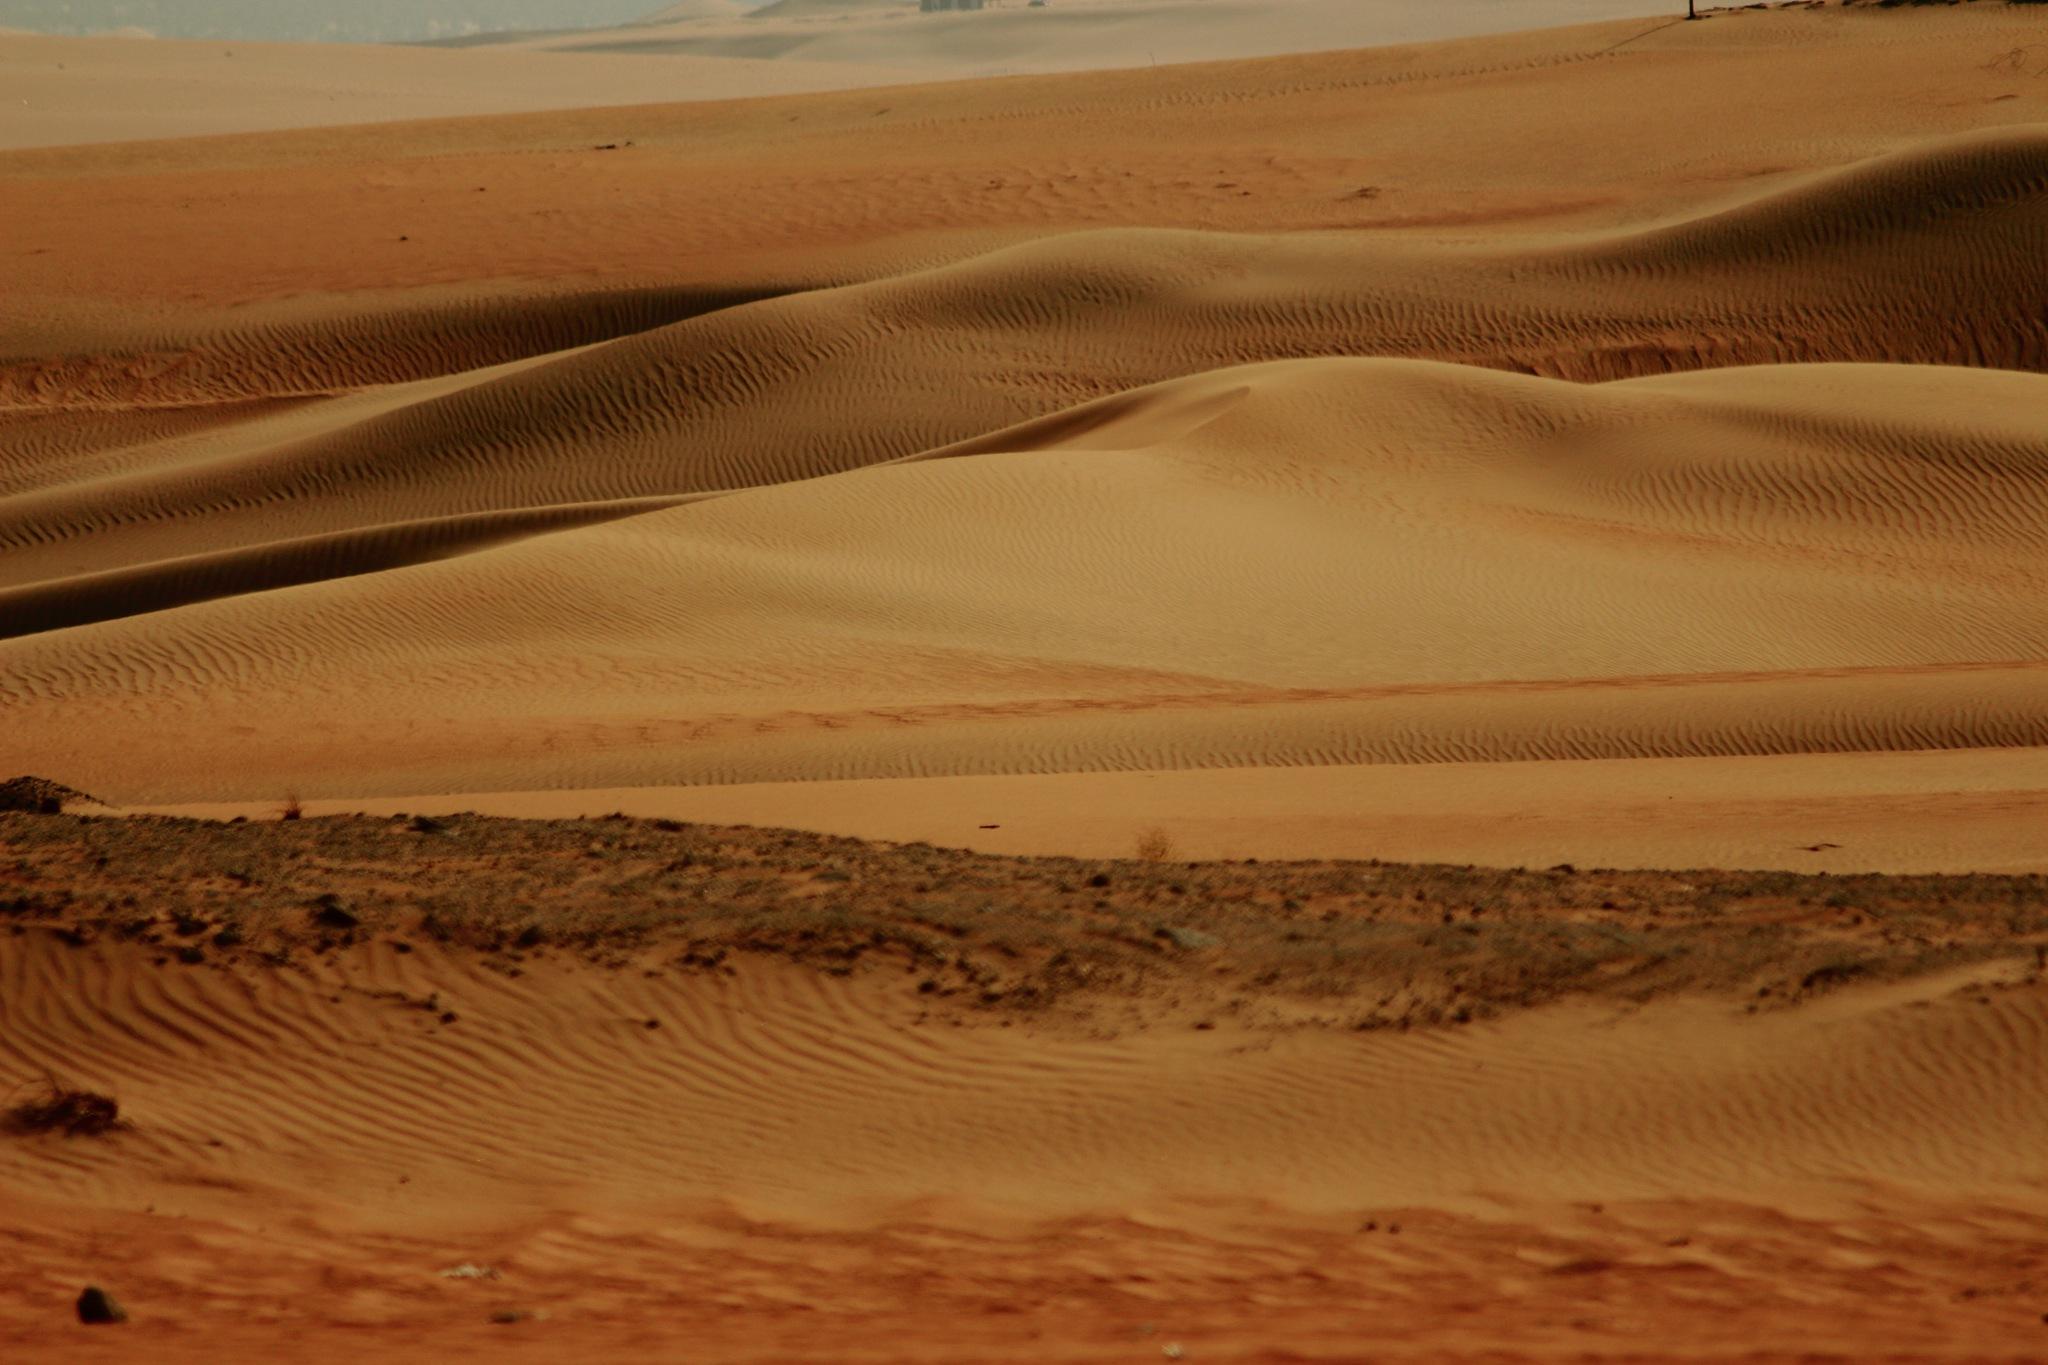 Sand Dunes by Sonans